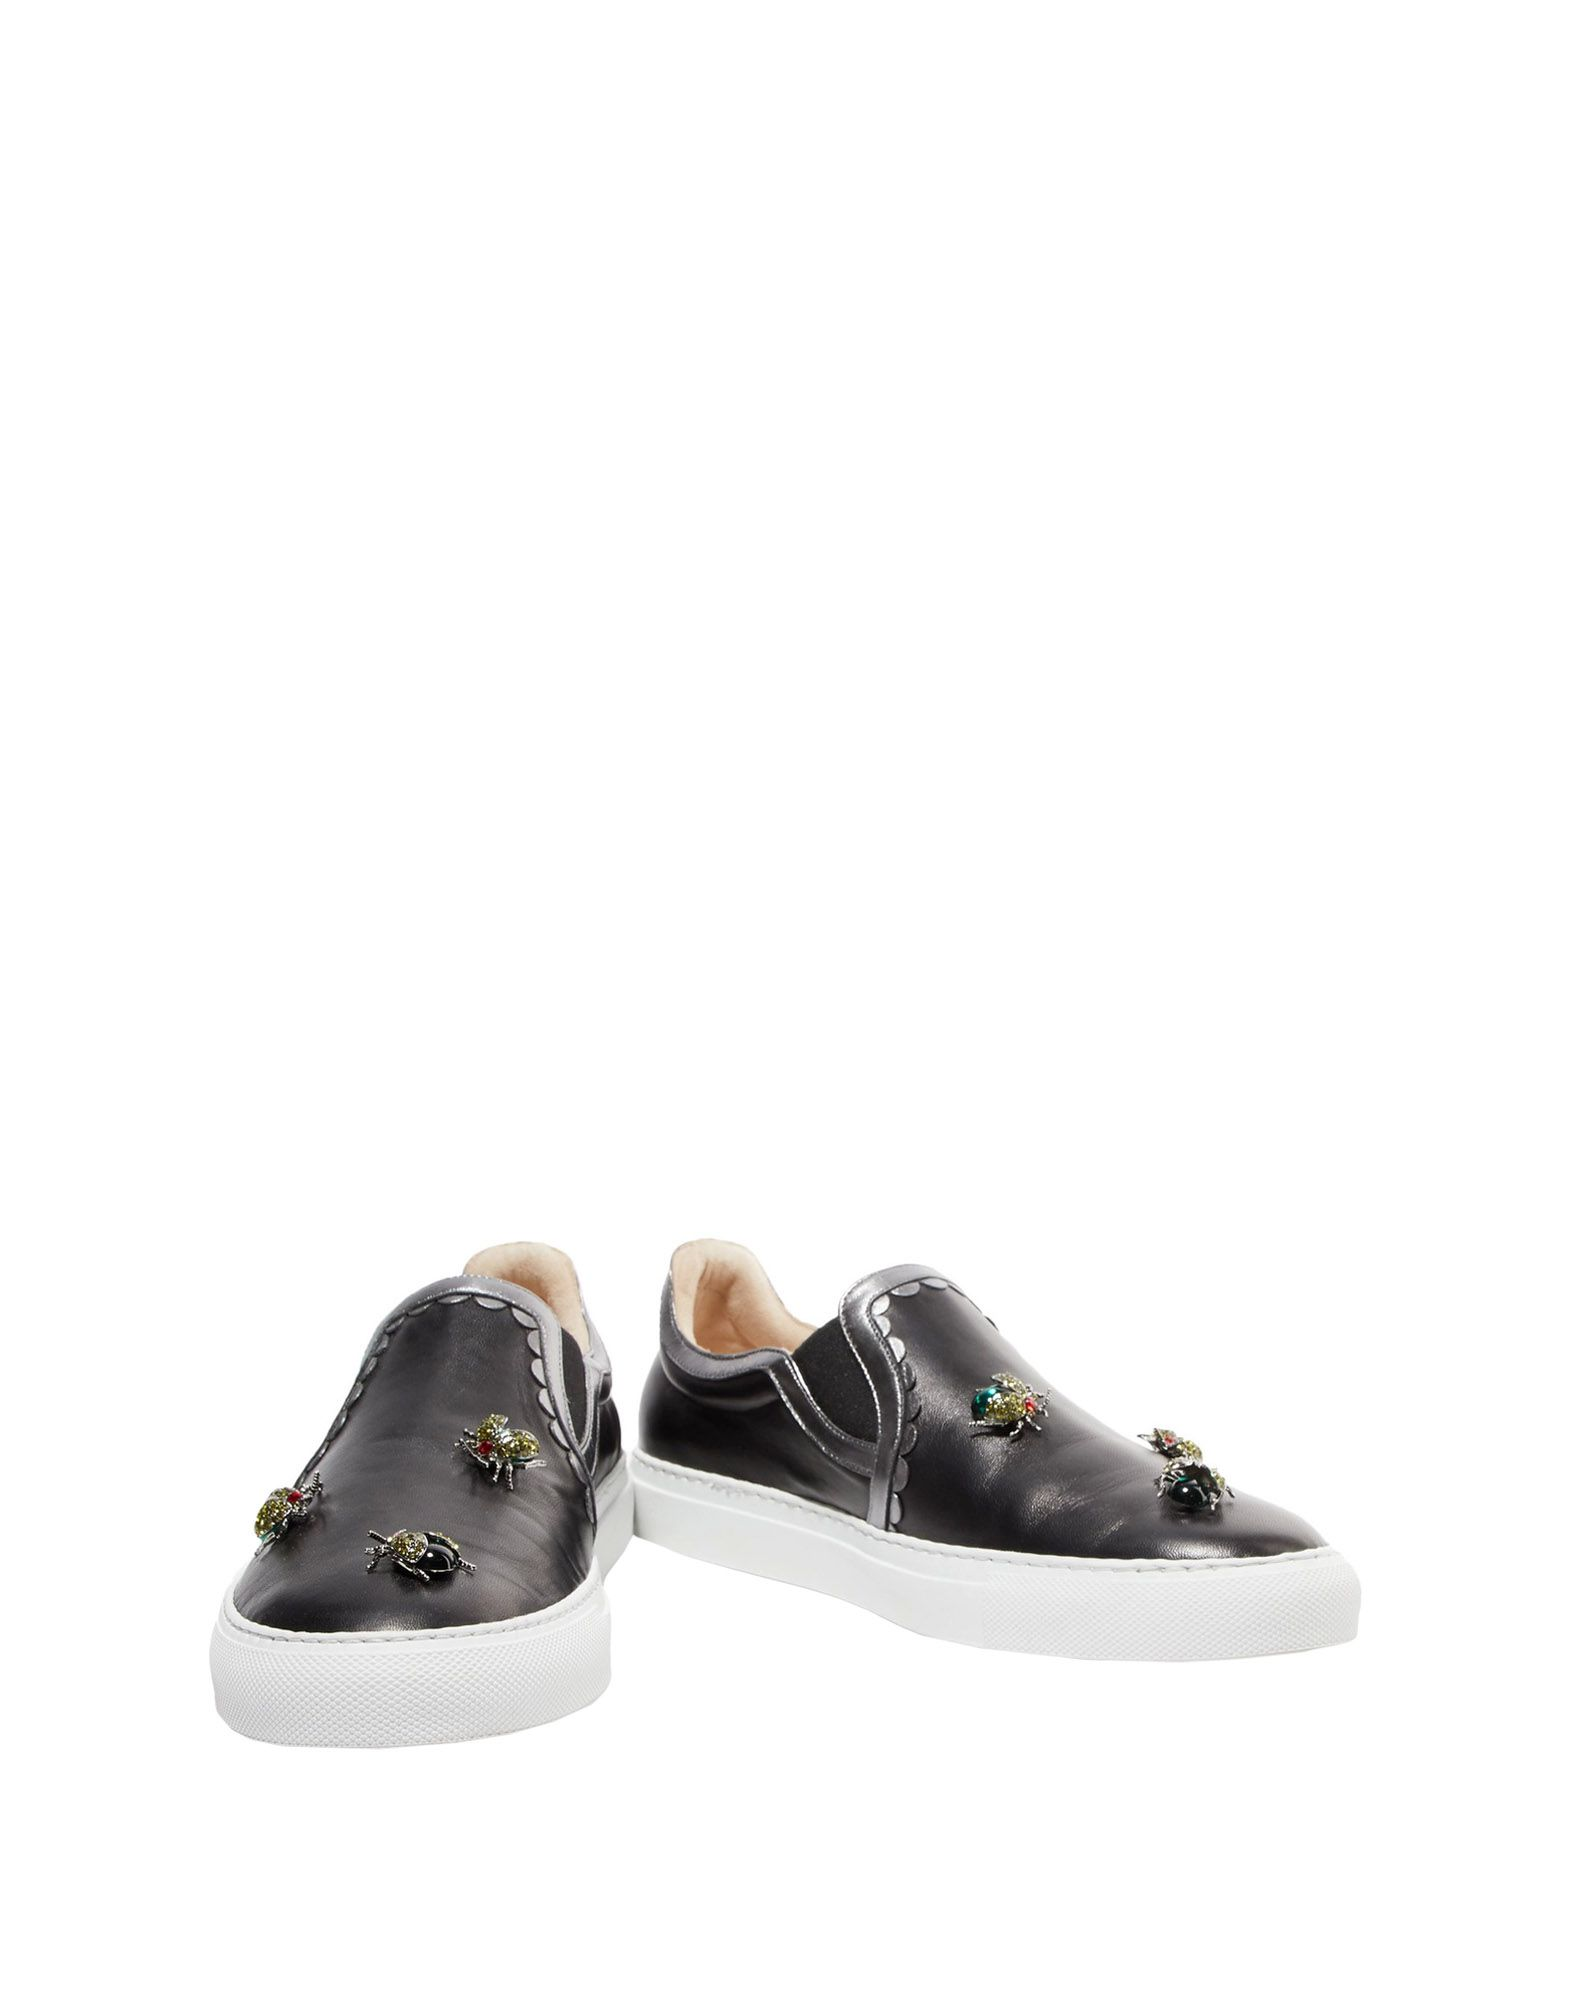 CAMILLA ELPHICK Sneakers in Black